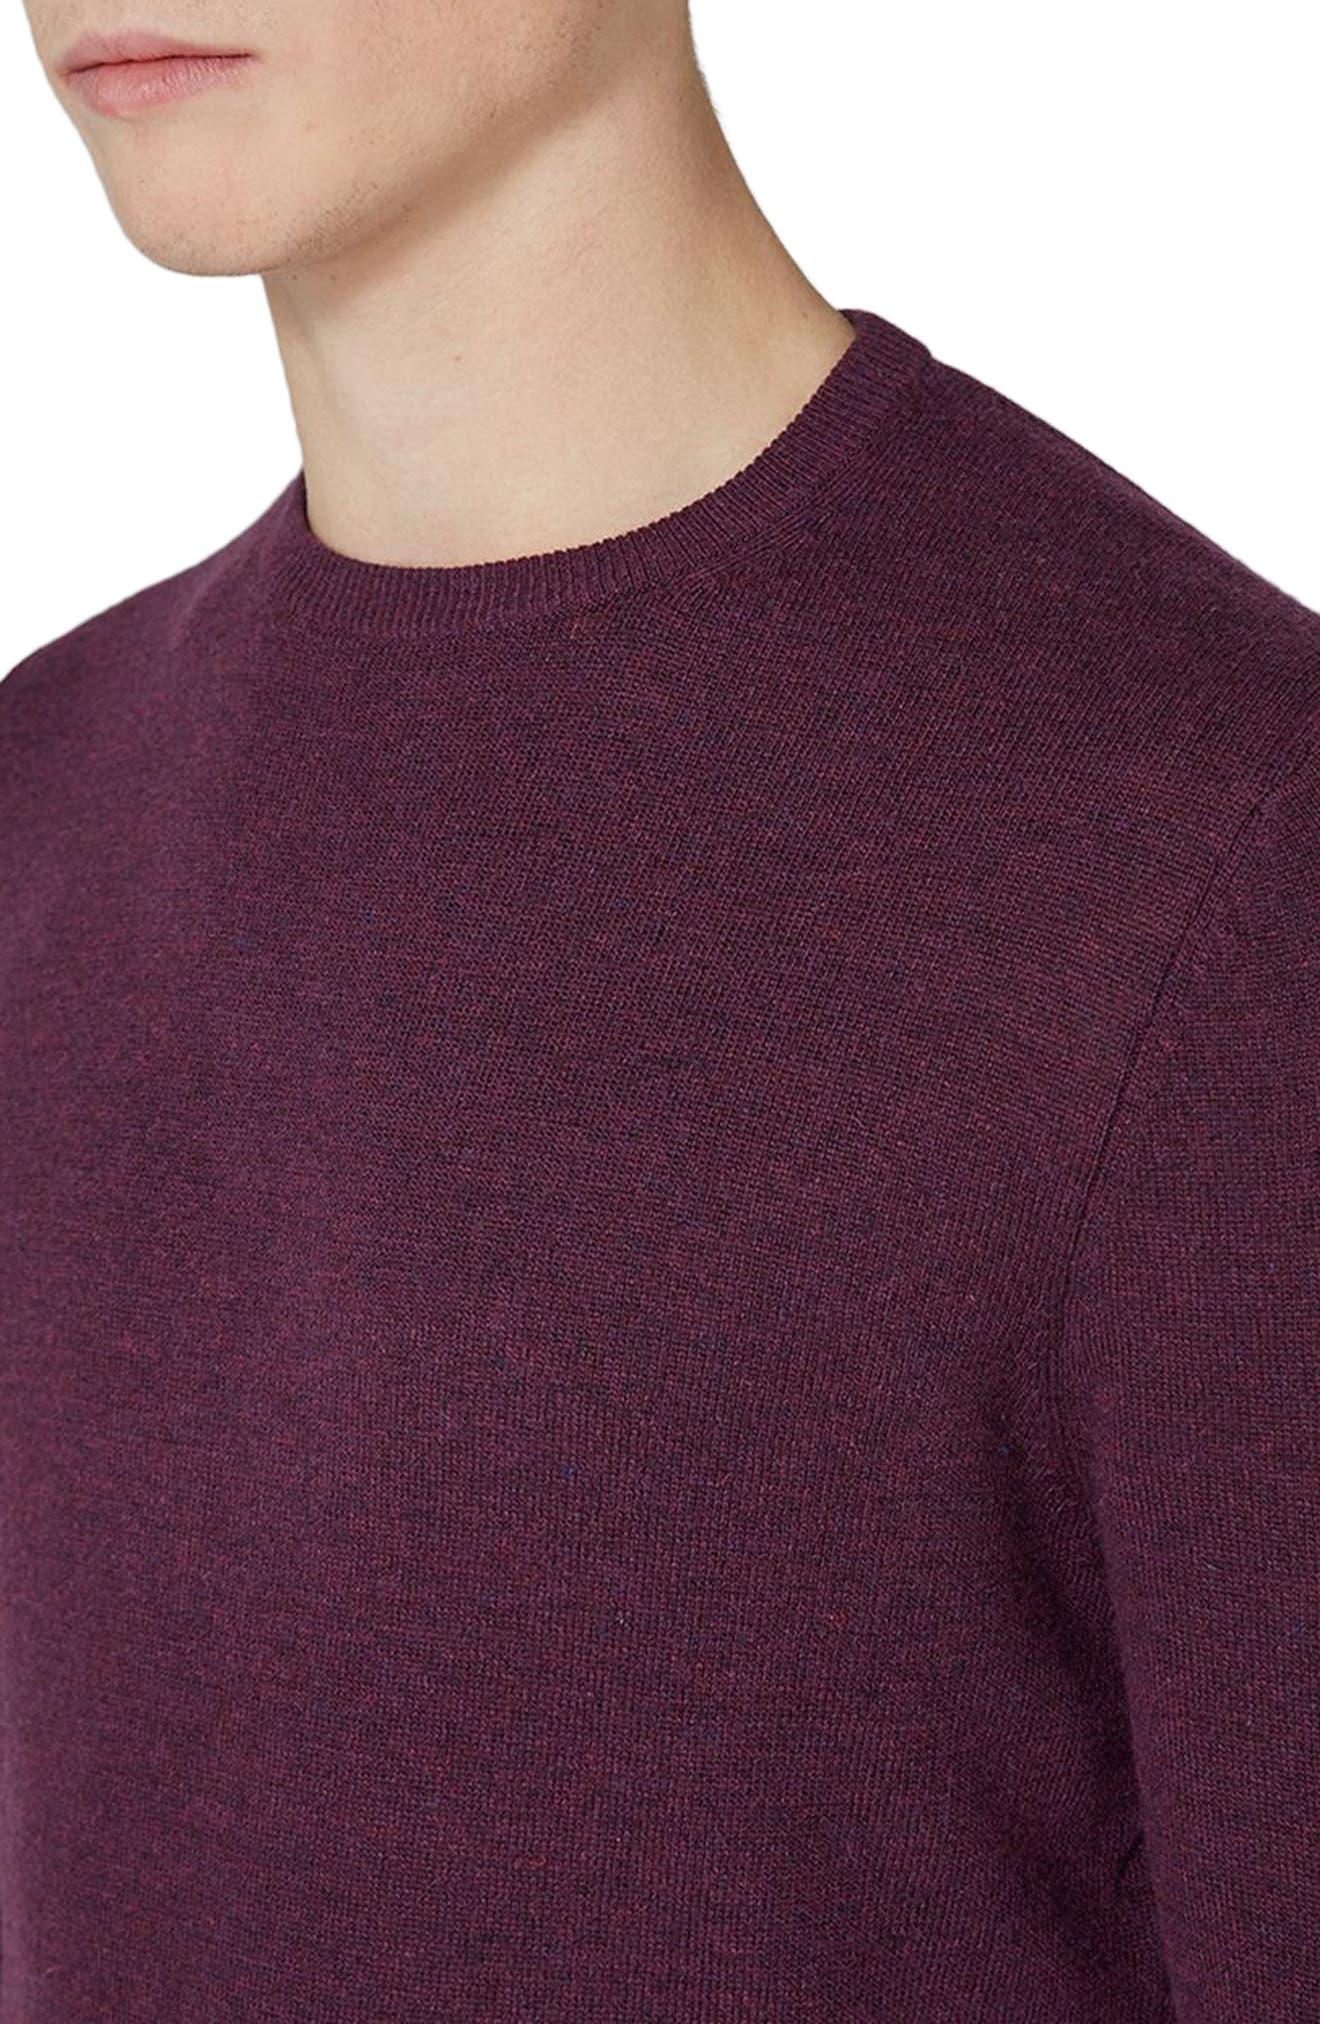 Crewneck Sweater,                             Alternate thumbnail 3, color,                             BURGUNDY